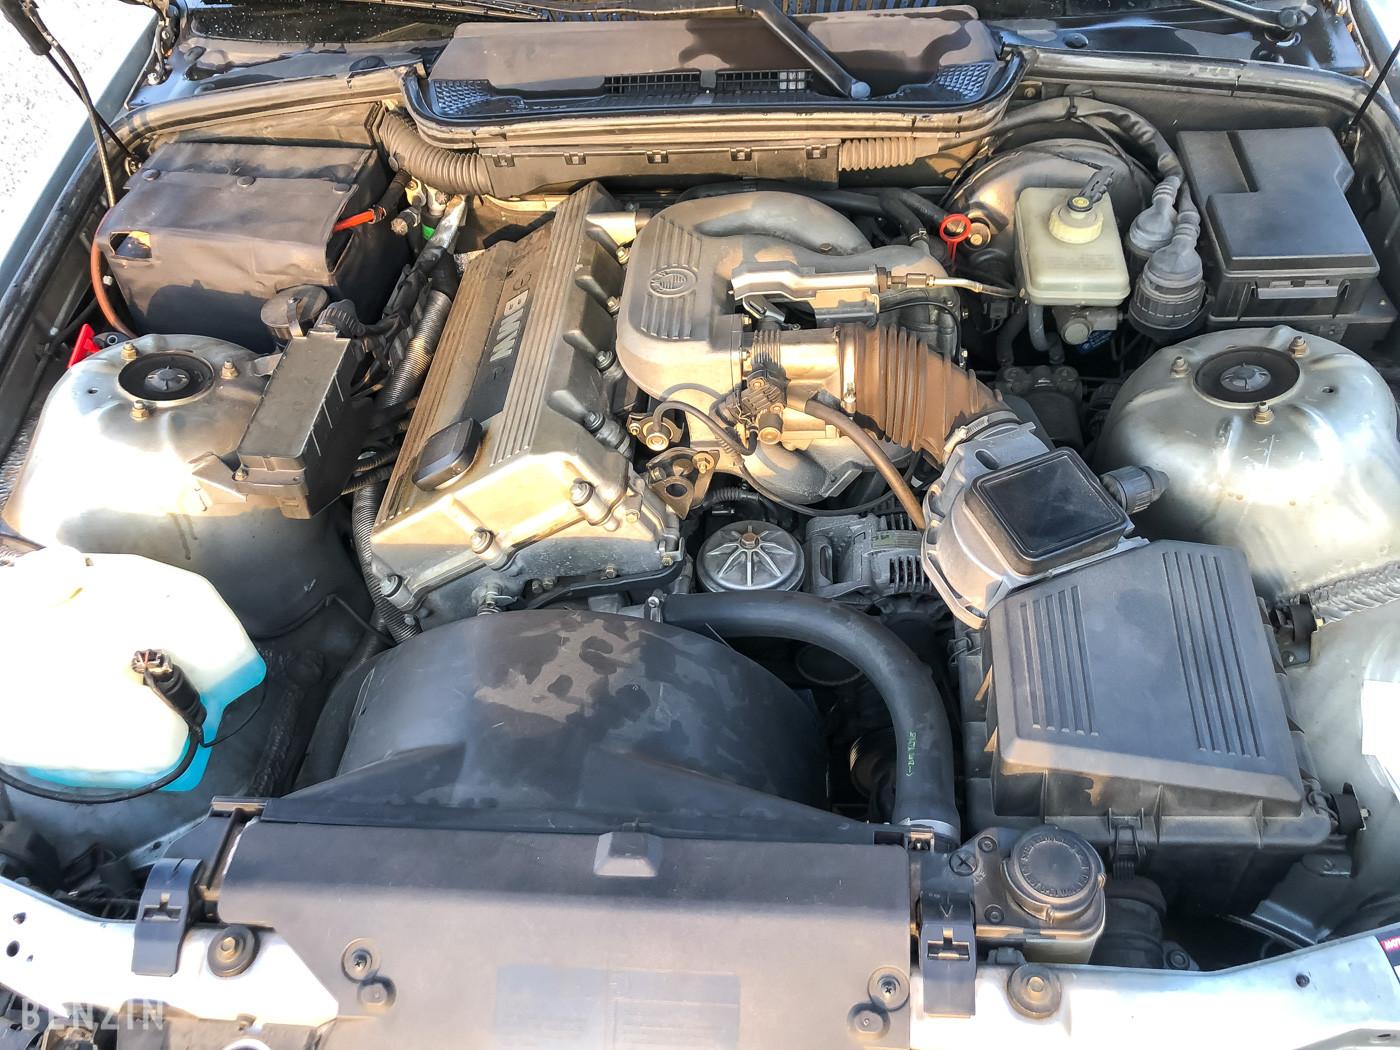 BMW 318is occasion à vendre